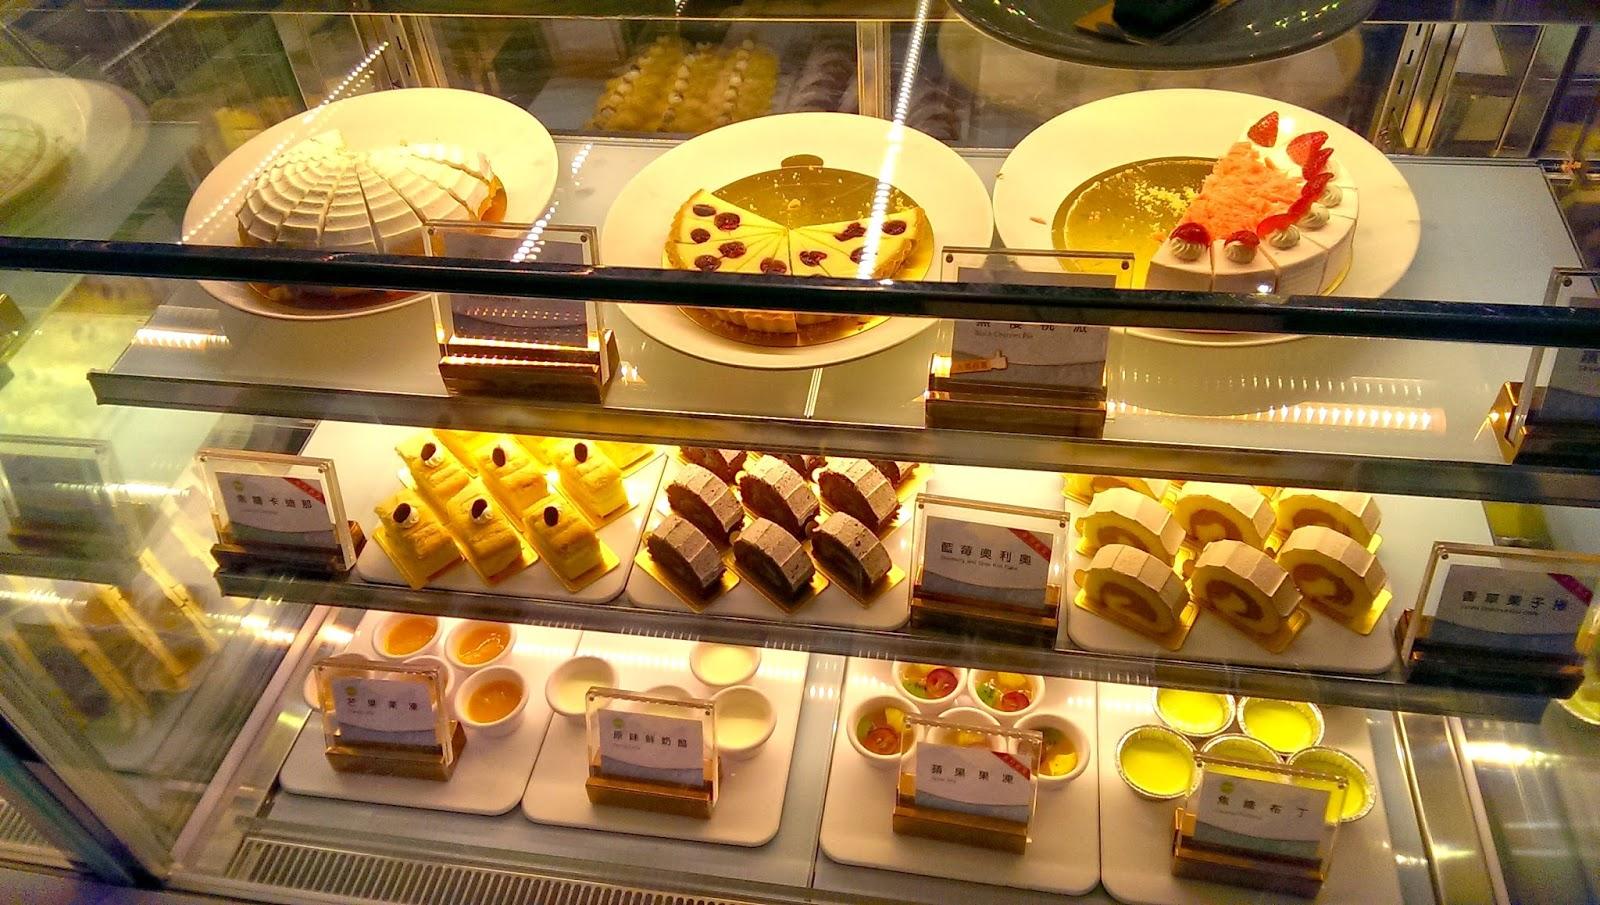 2015 07 01%2B18.58.31 - [食記] 台北京站 - 饗食天堂,有生魚片吃到飽的高級自助餐廳!